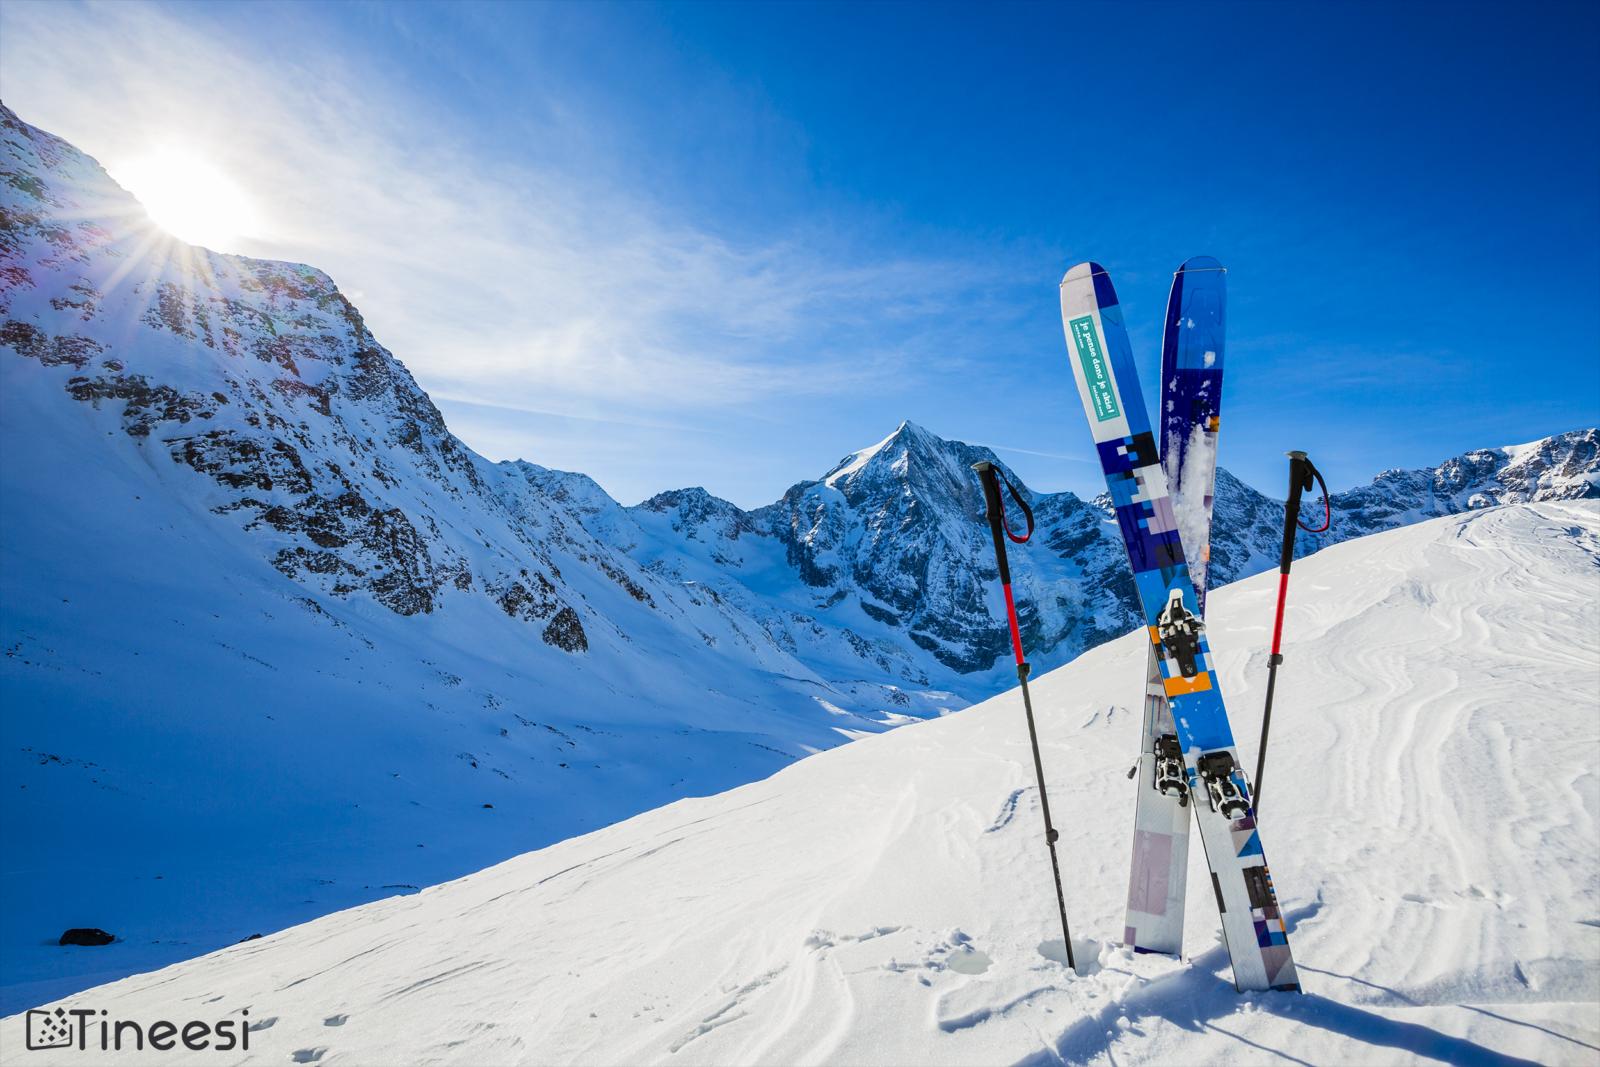 stickers skis objets pub stations